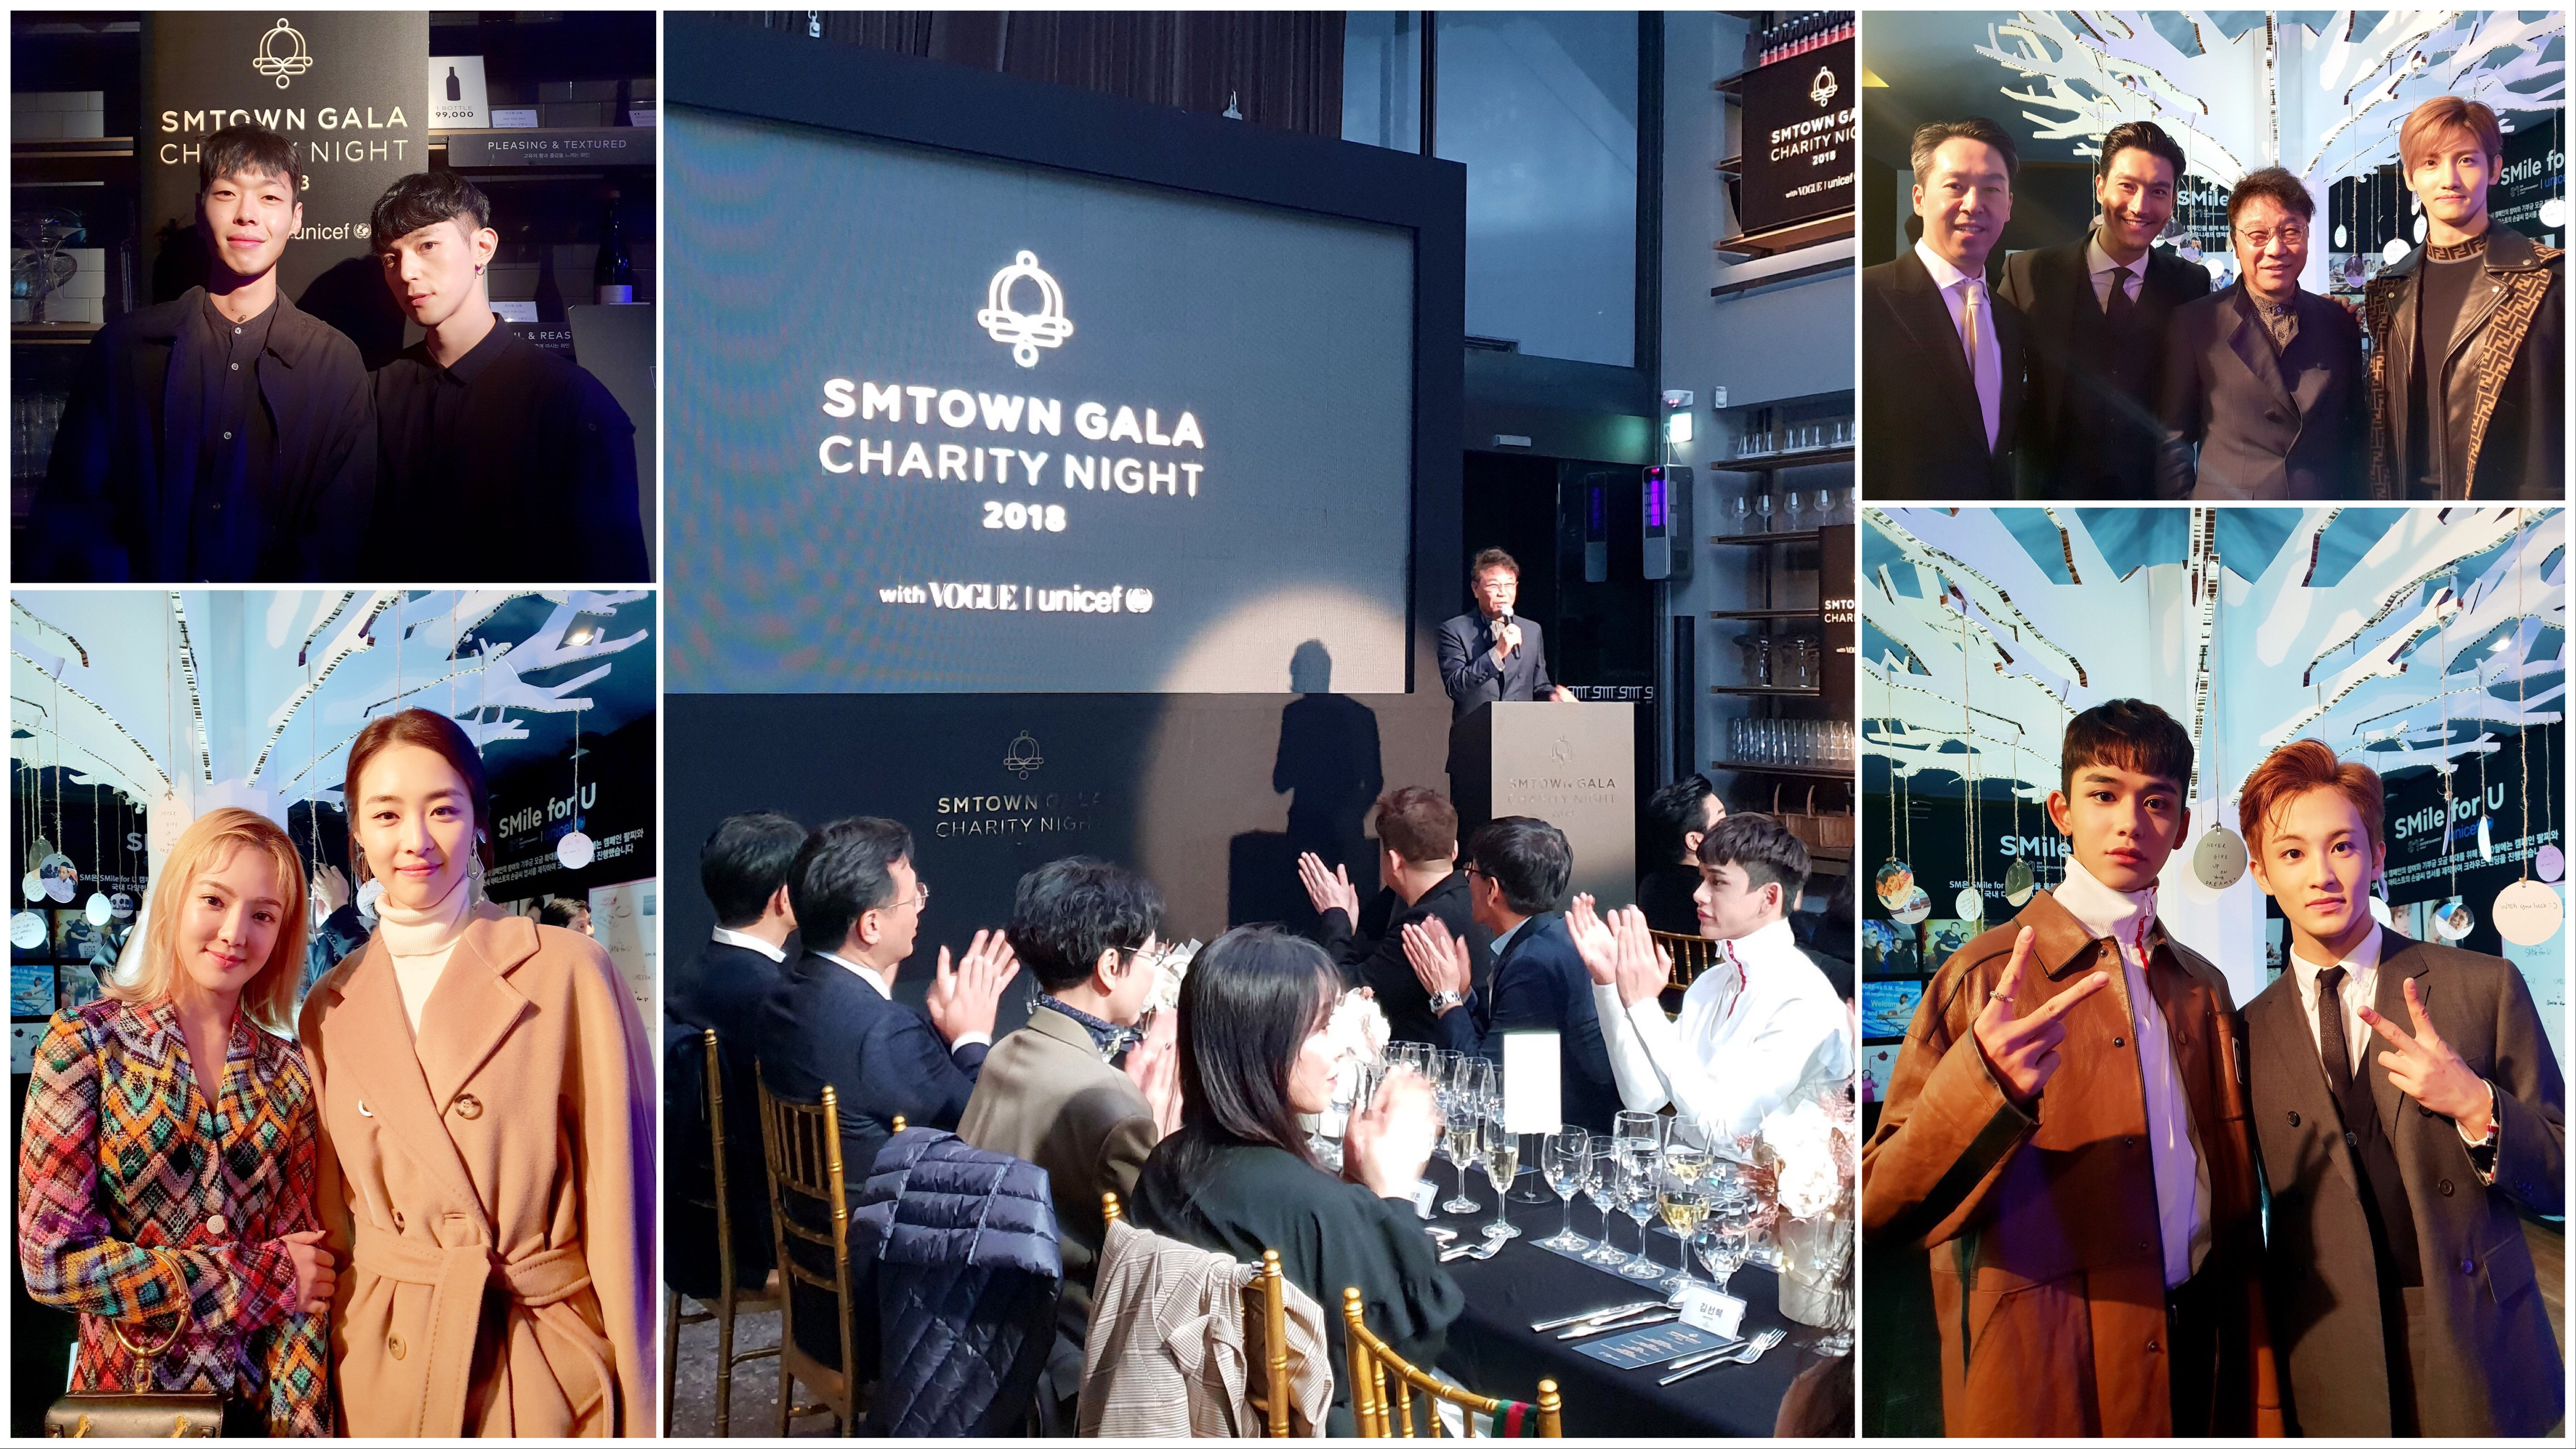 SMtown Gala Charity Nigth 2018